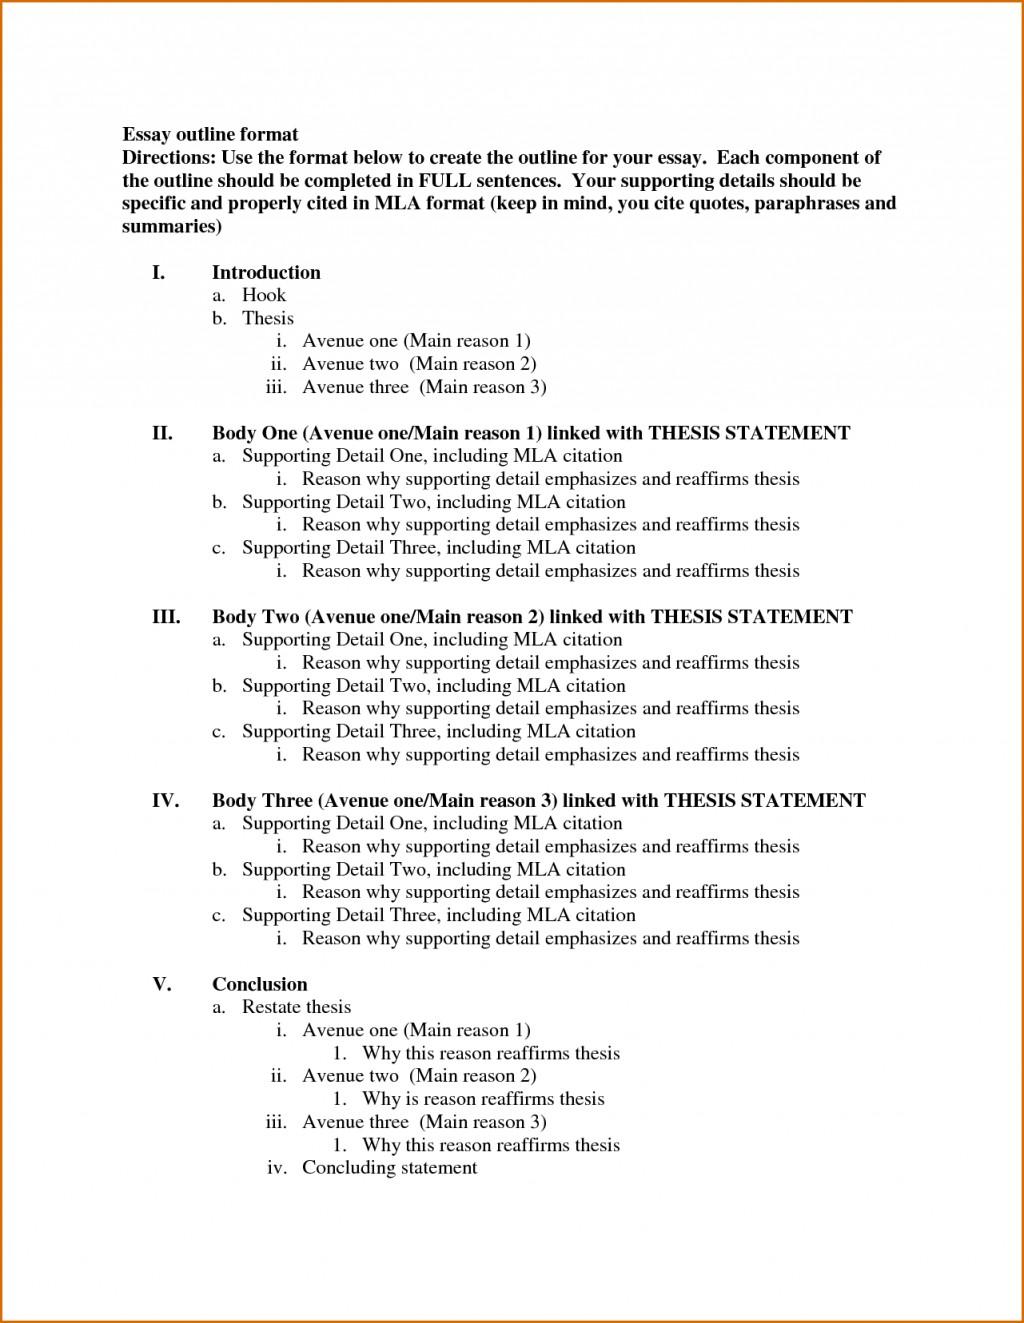 006 Template Essay Outline Example Excellent Mla Argumentative High School Research Paper Pdf Large